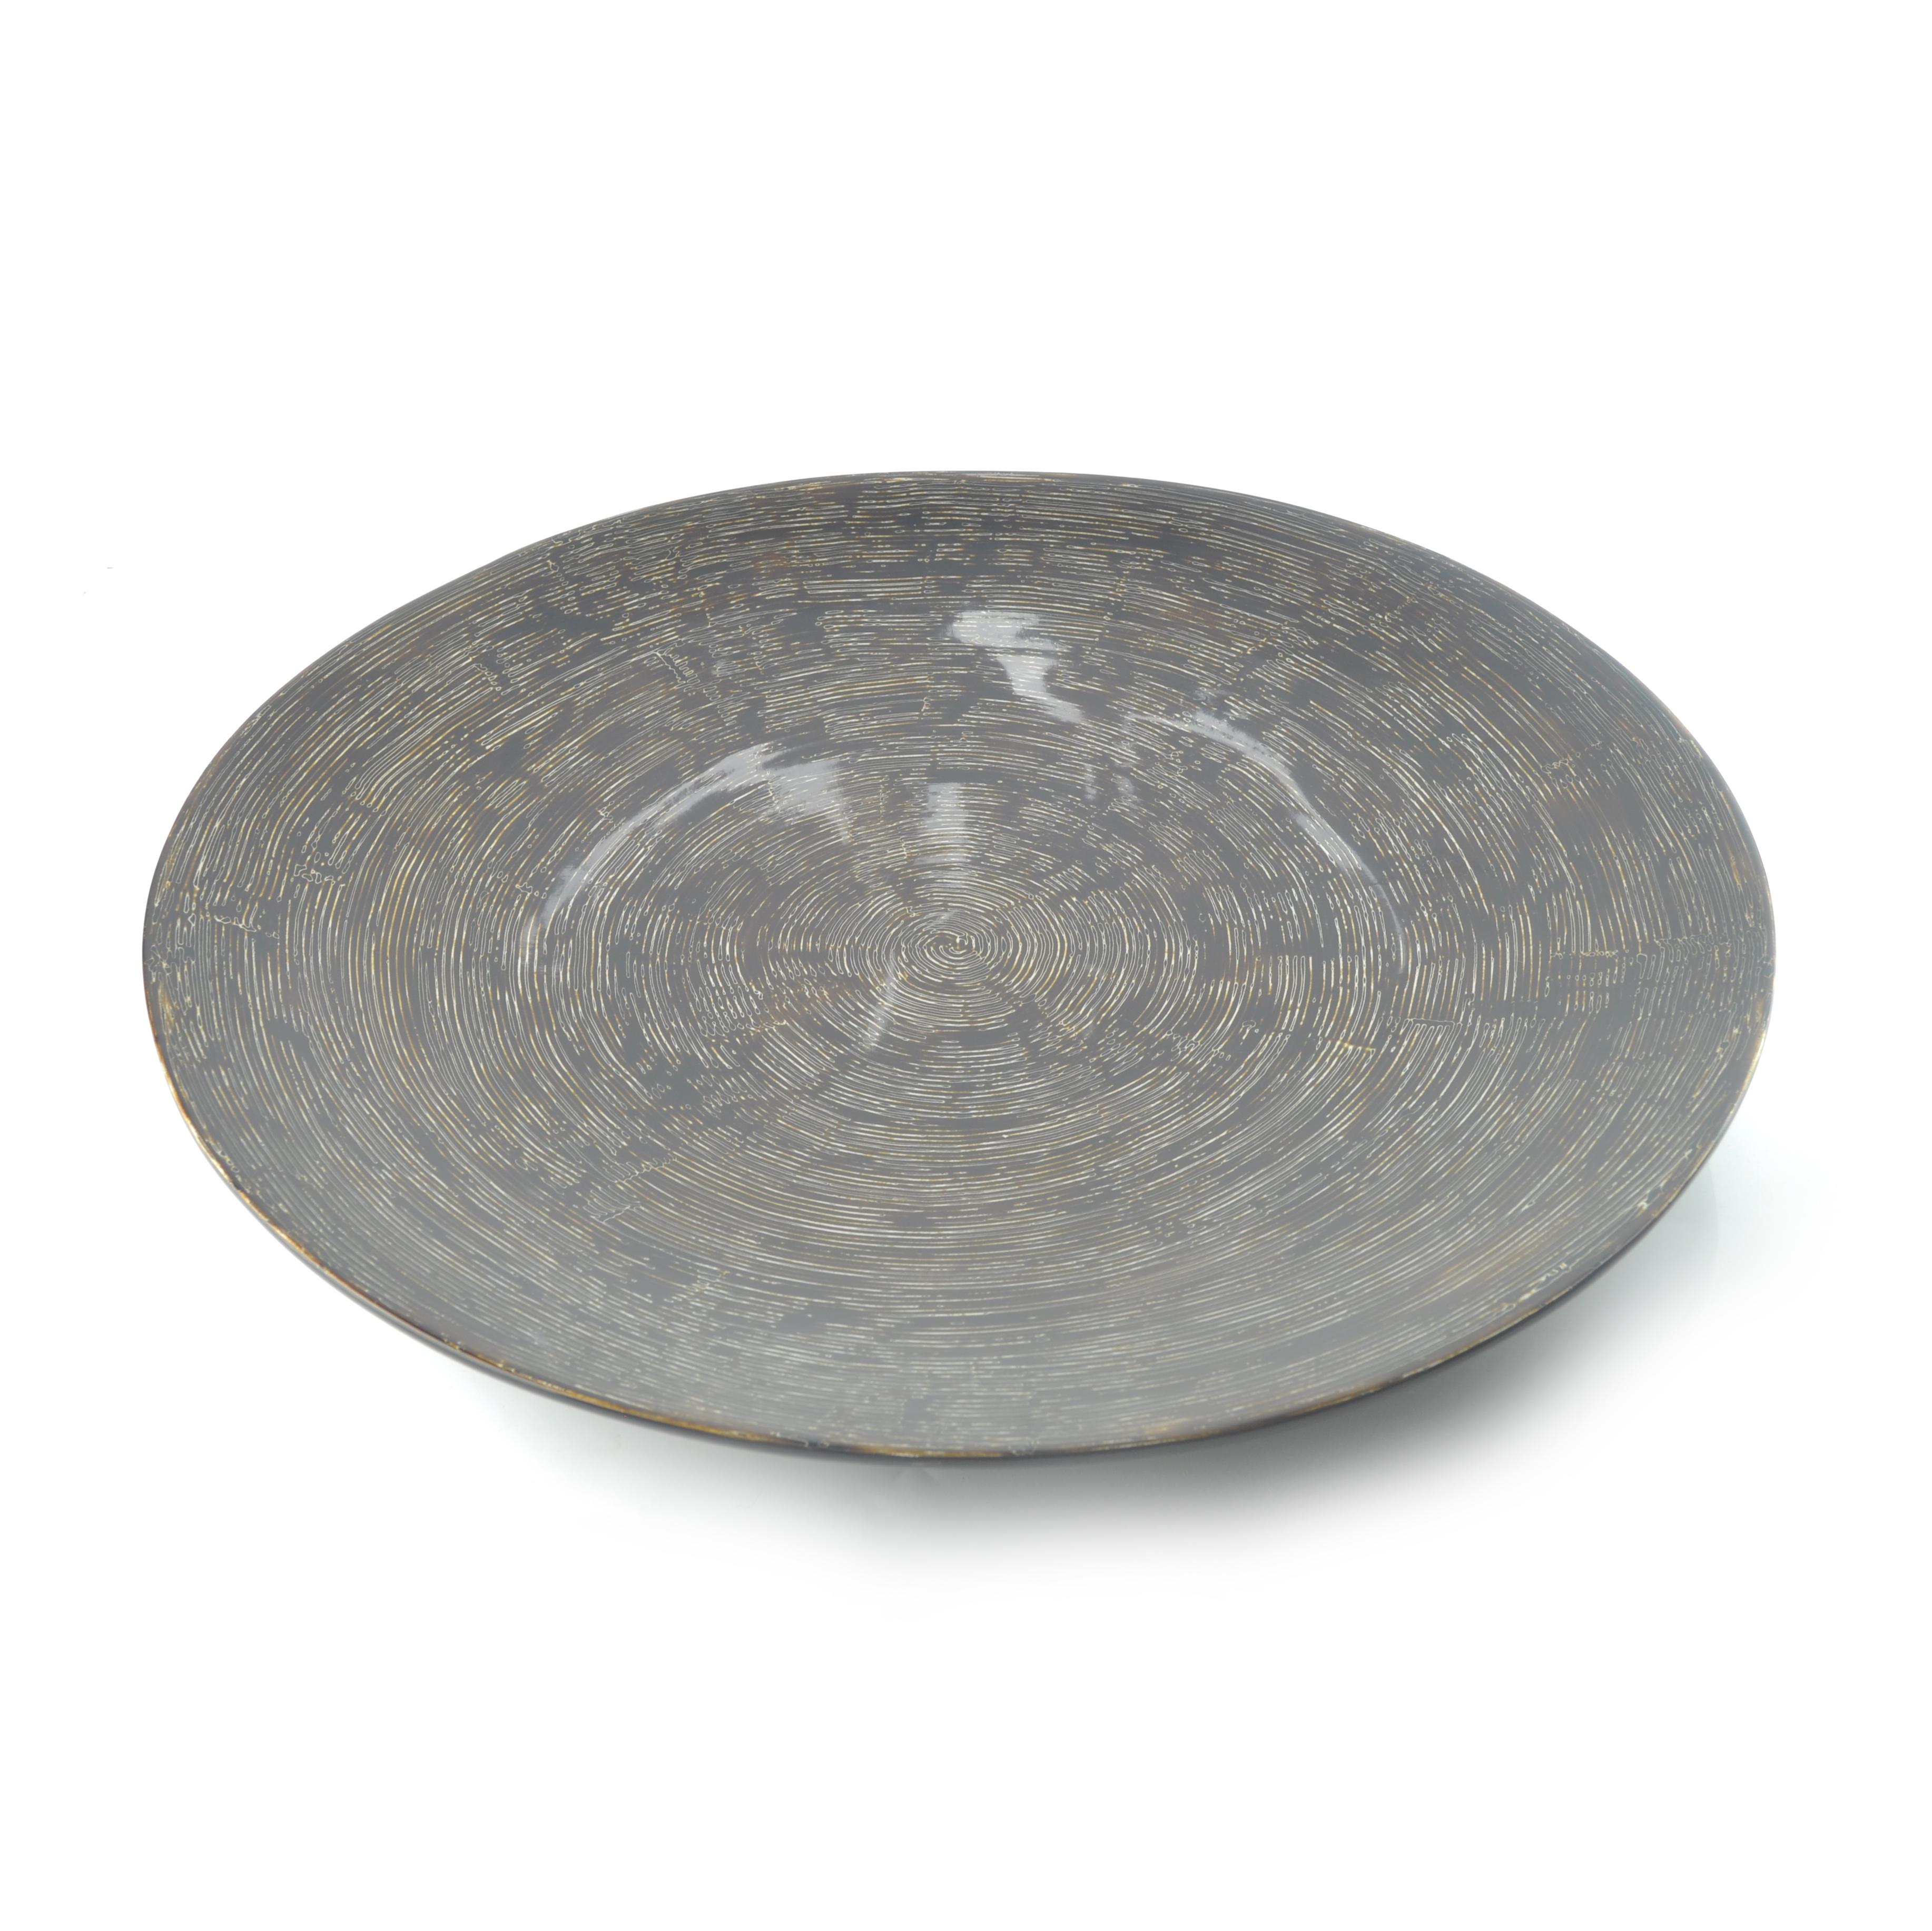 Wood Grain Lacquer Plate